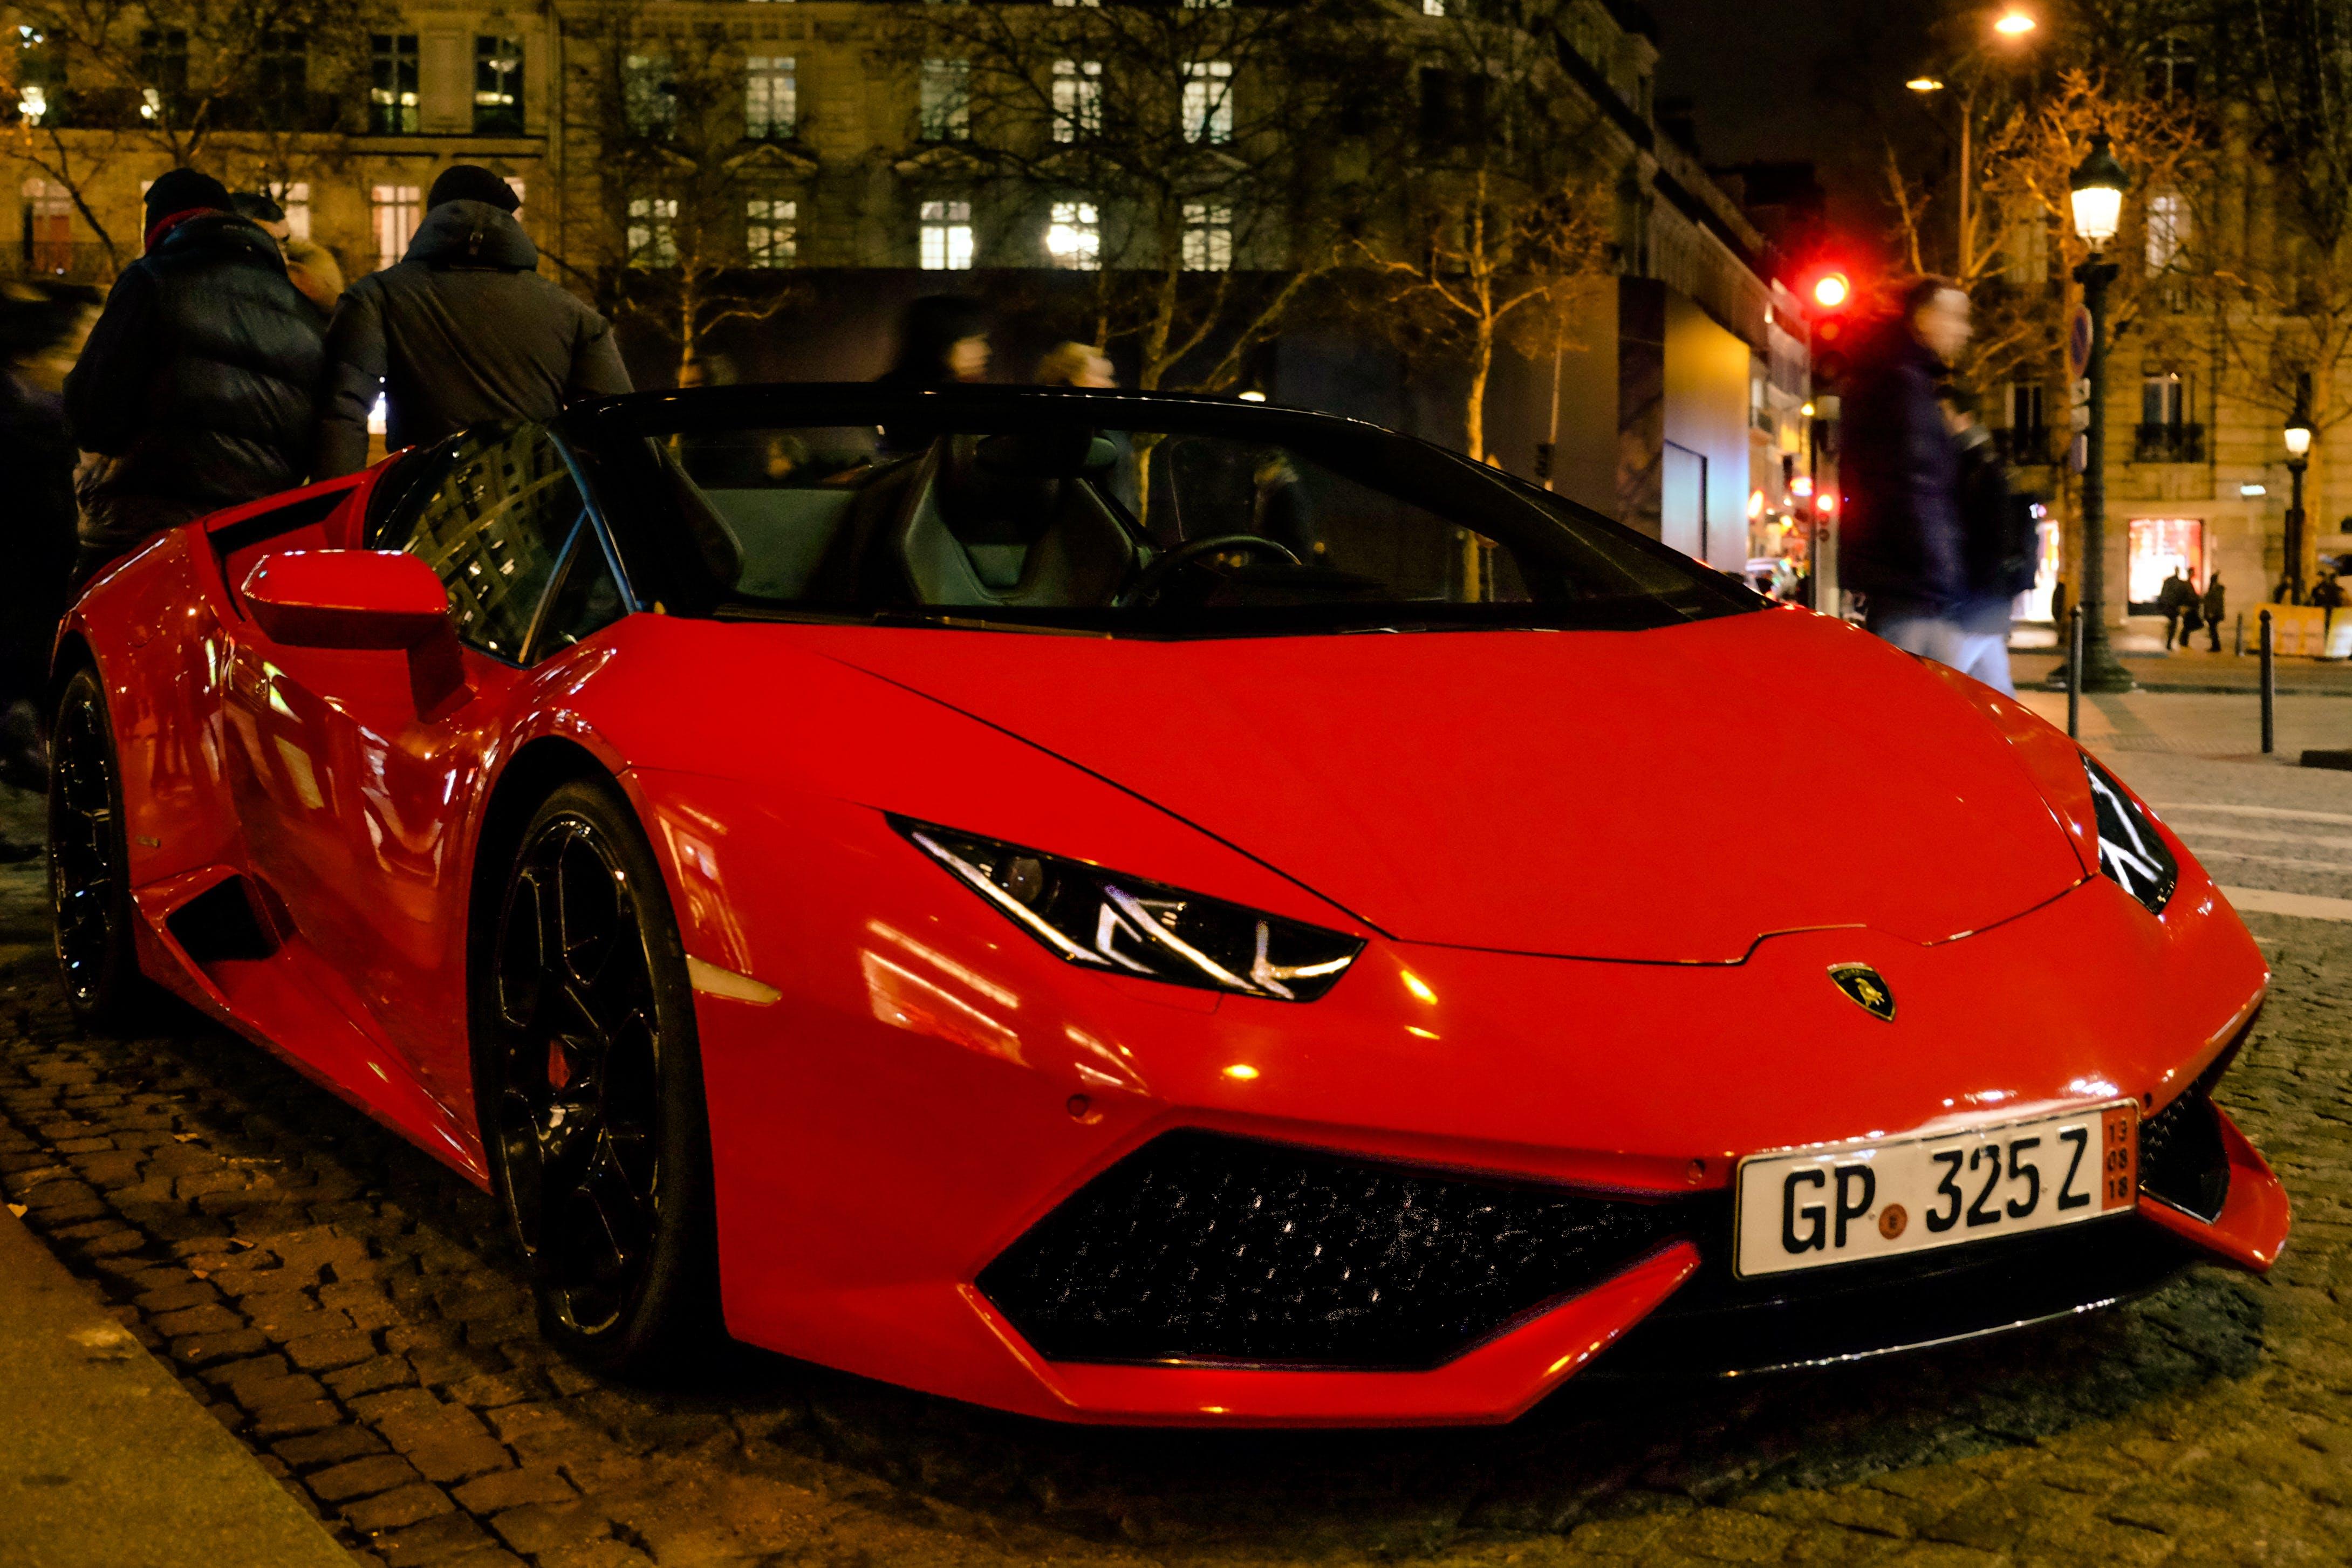 Free stock photo of car, city, city life, city lights